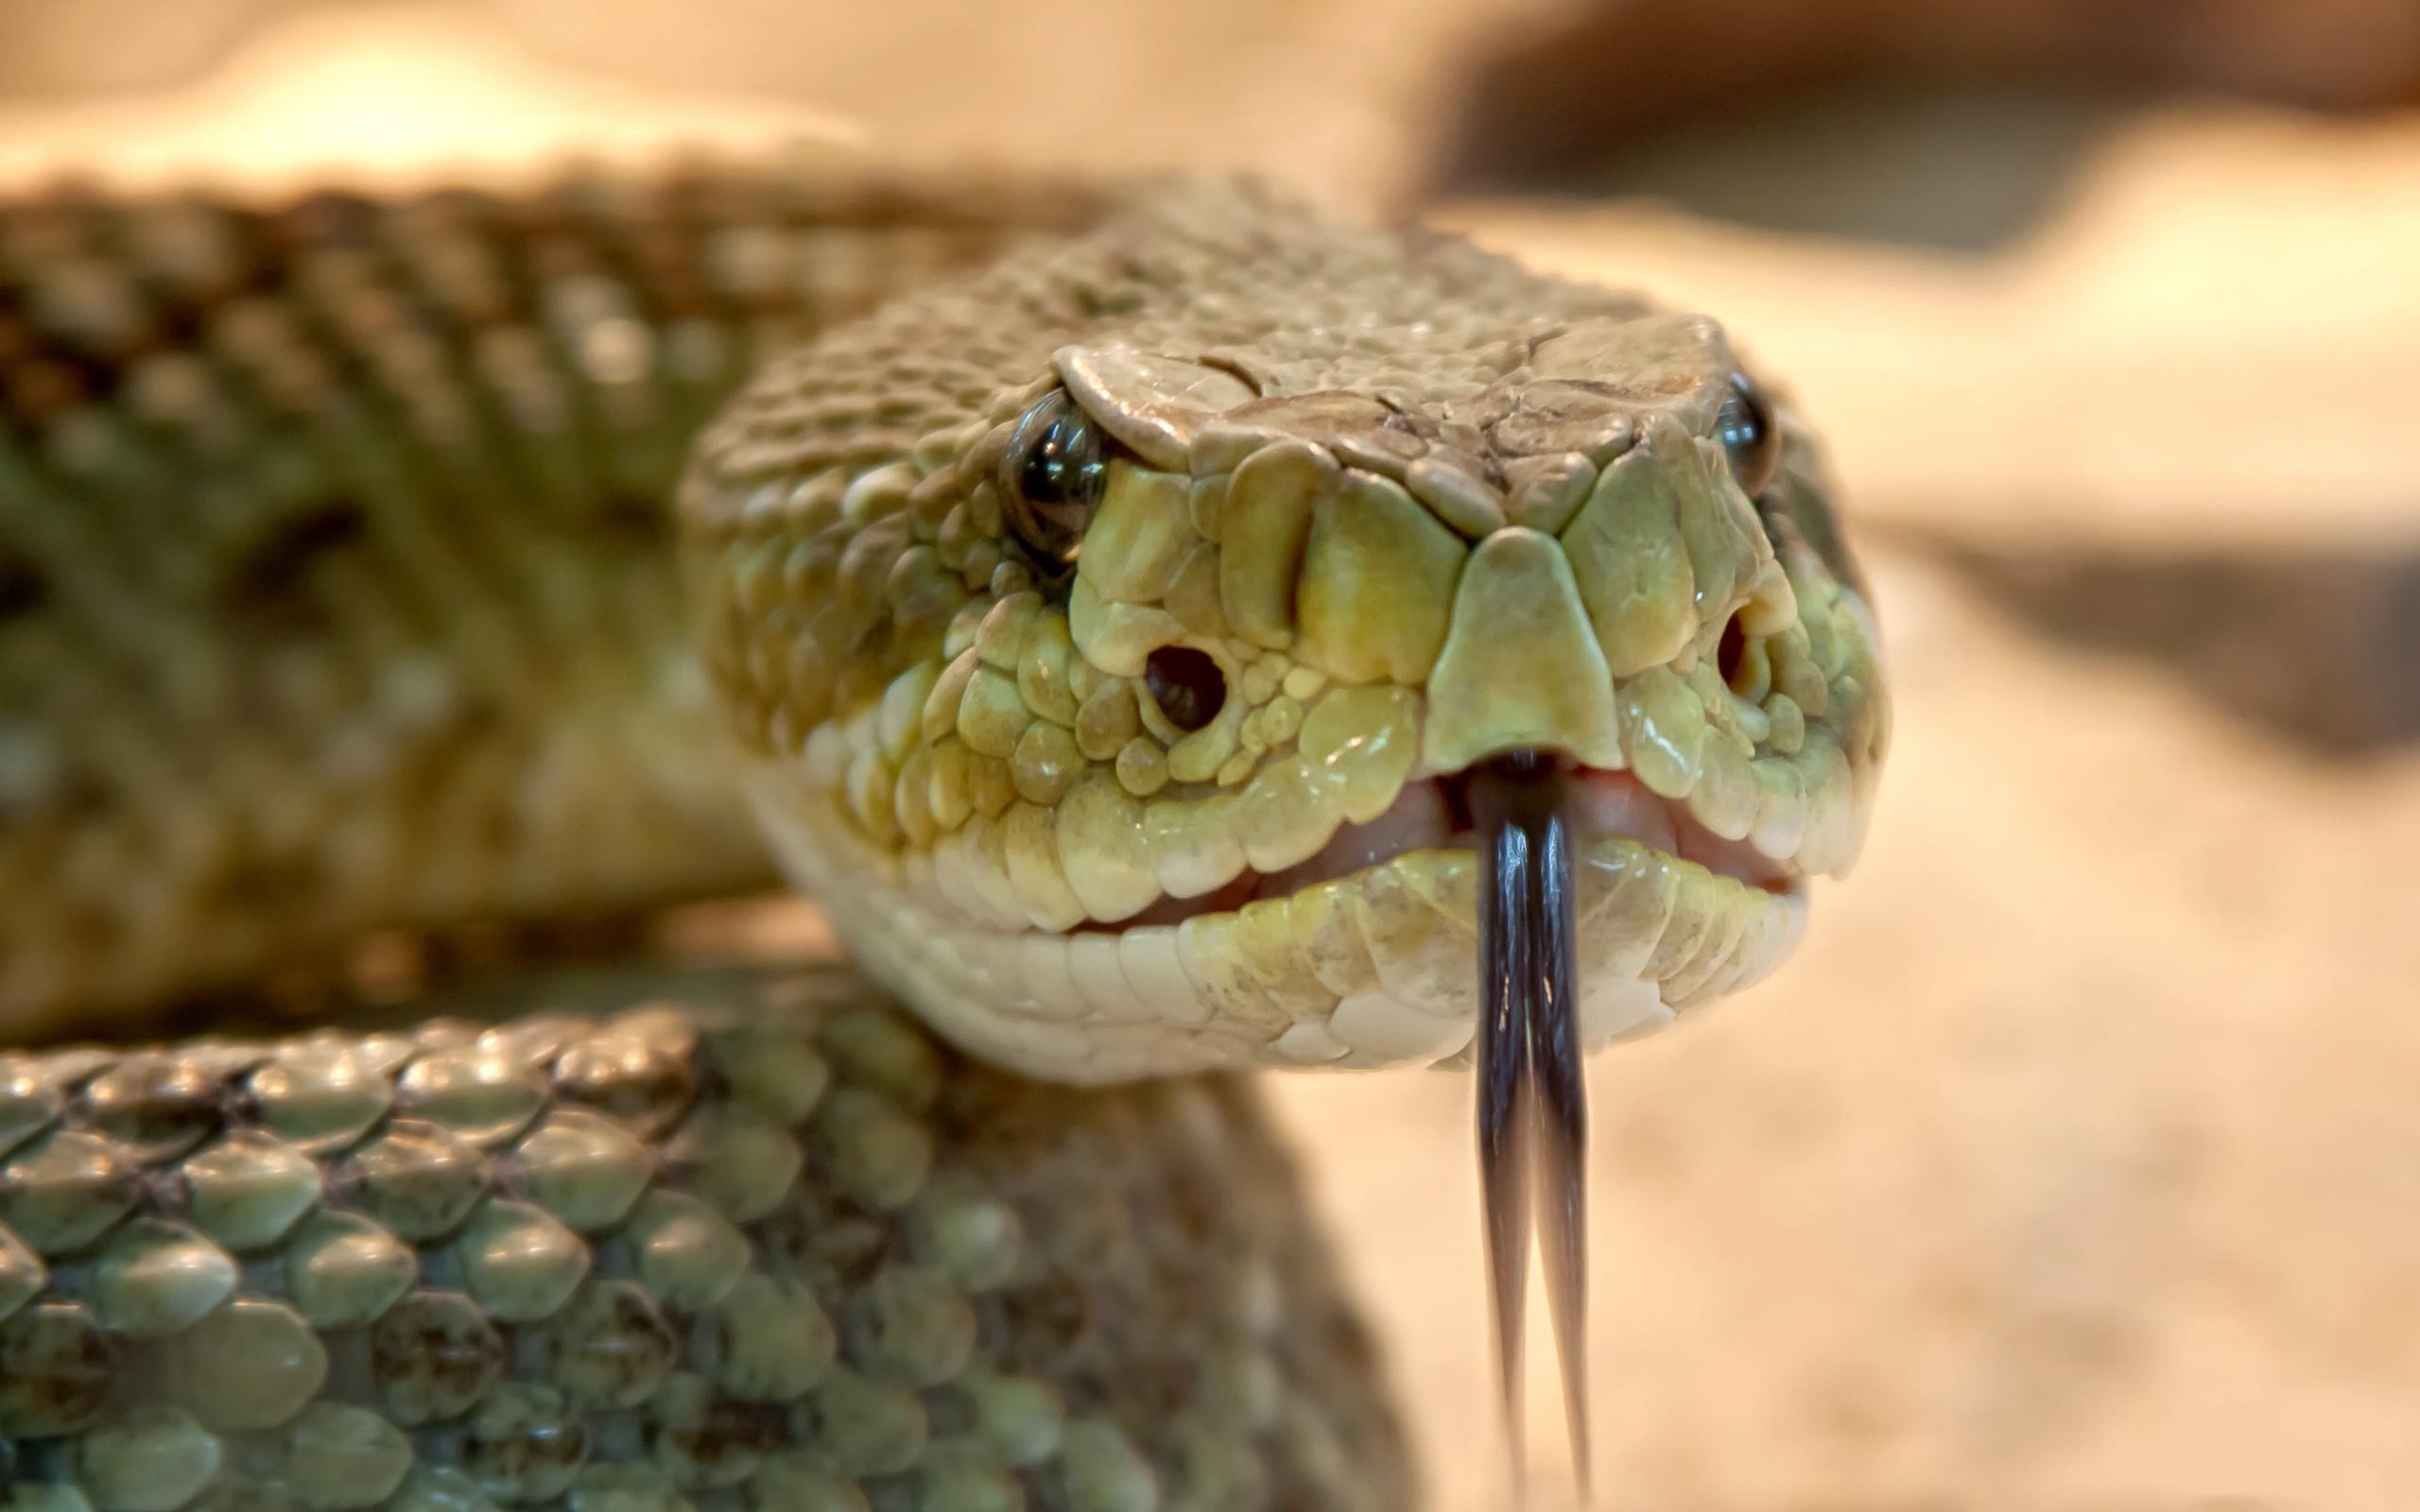 змея, размытый фон, голова, Язык